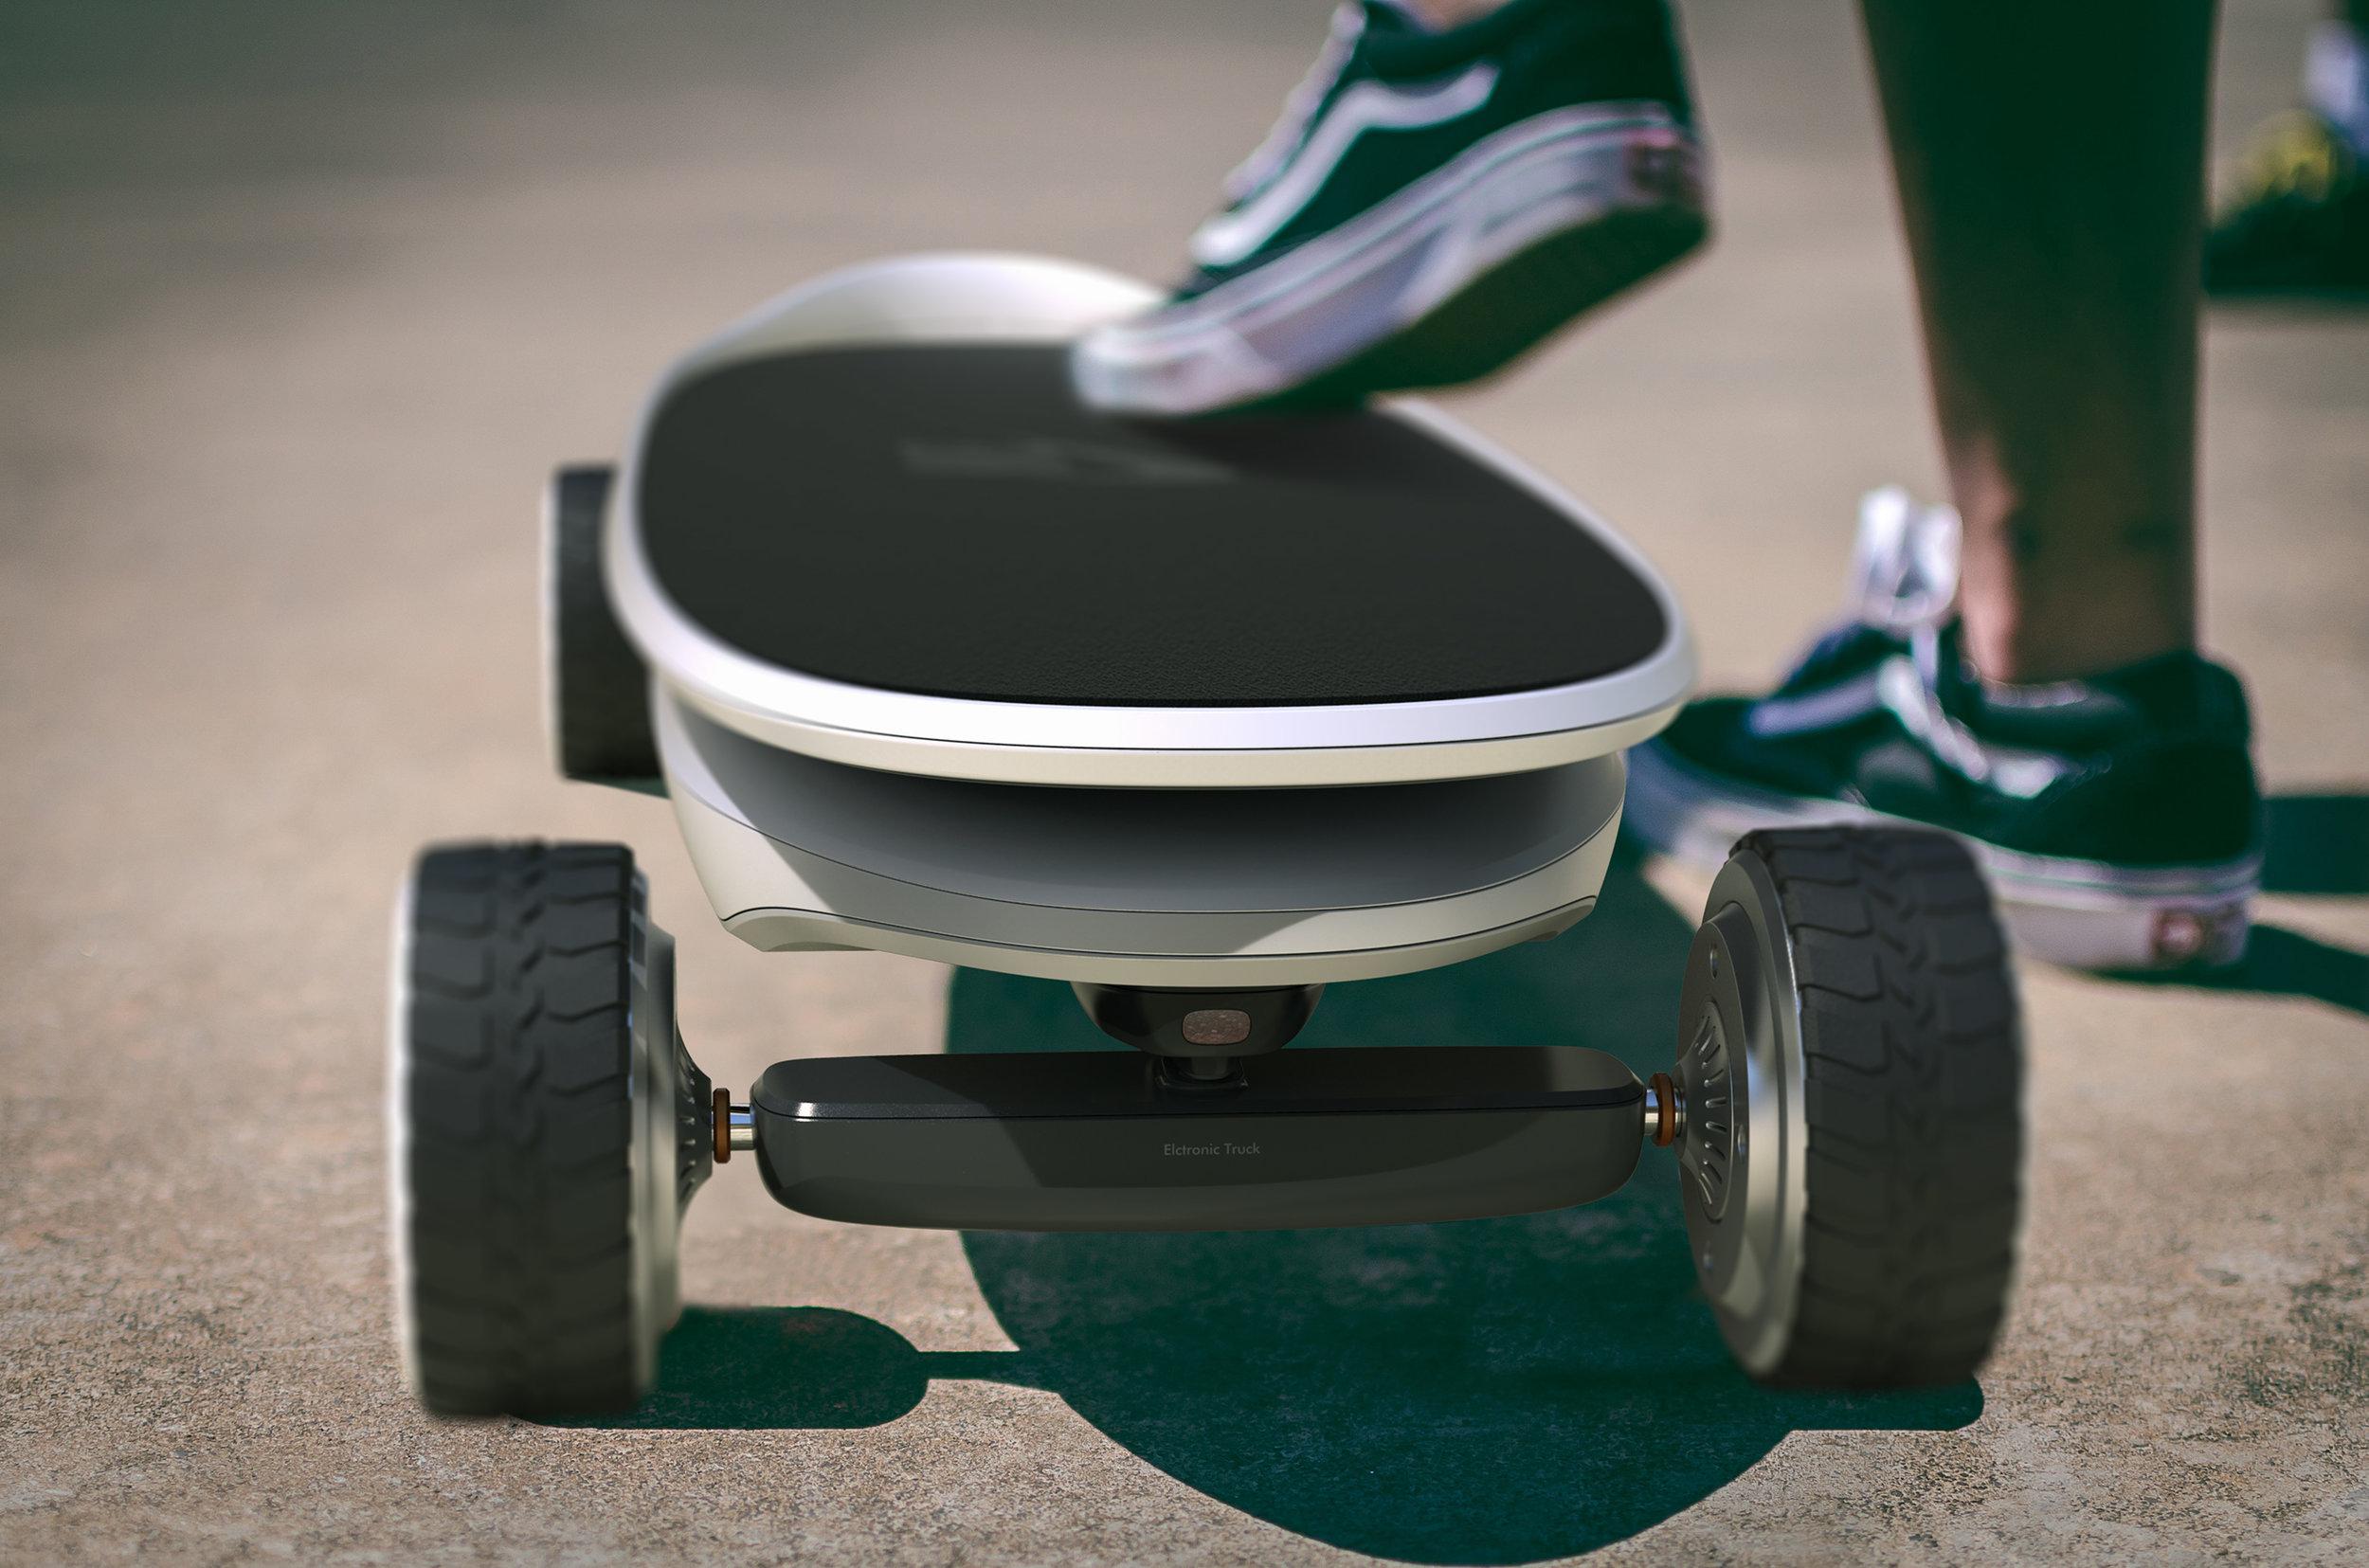 electric-scooter-jaehyuk-lim-13.jpg